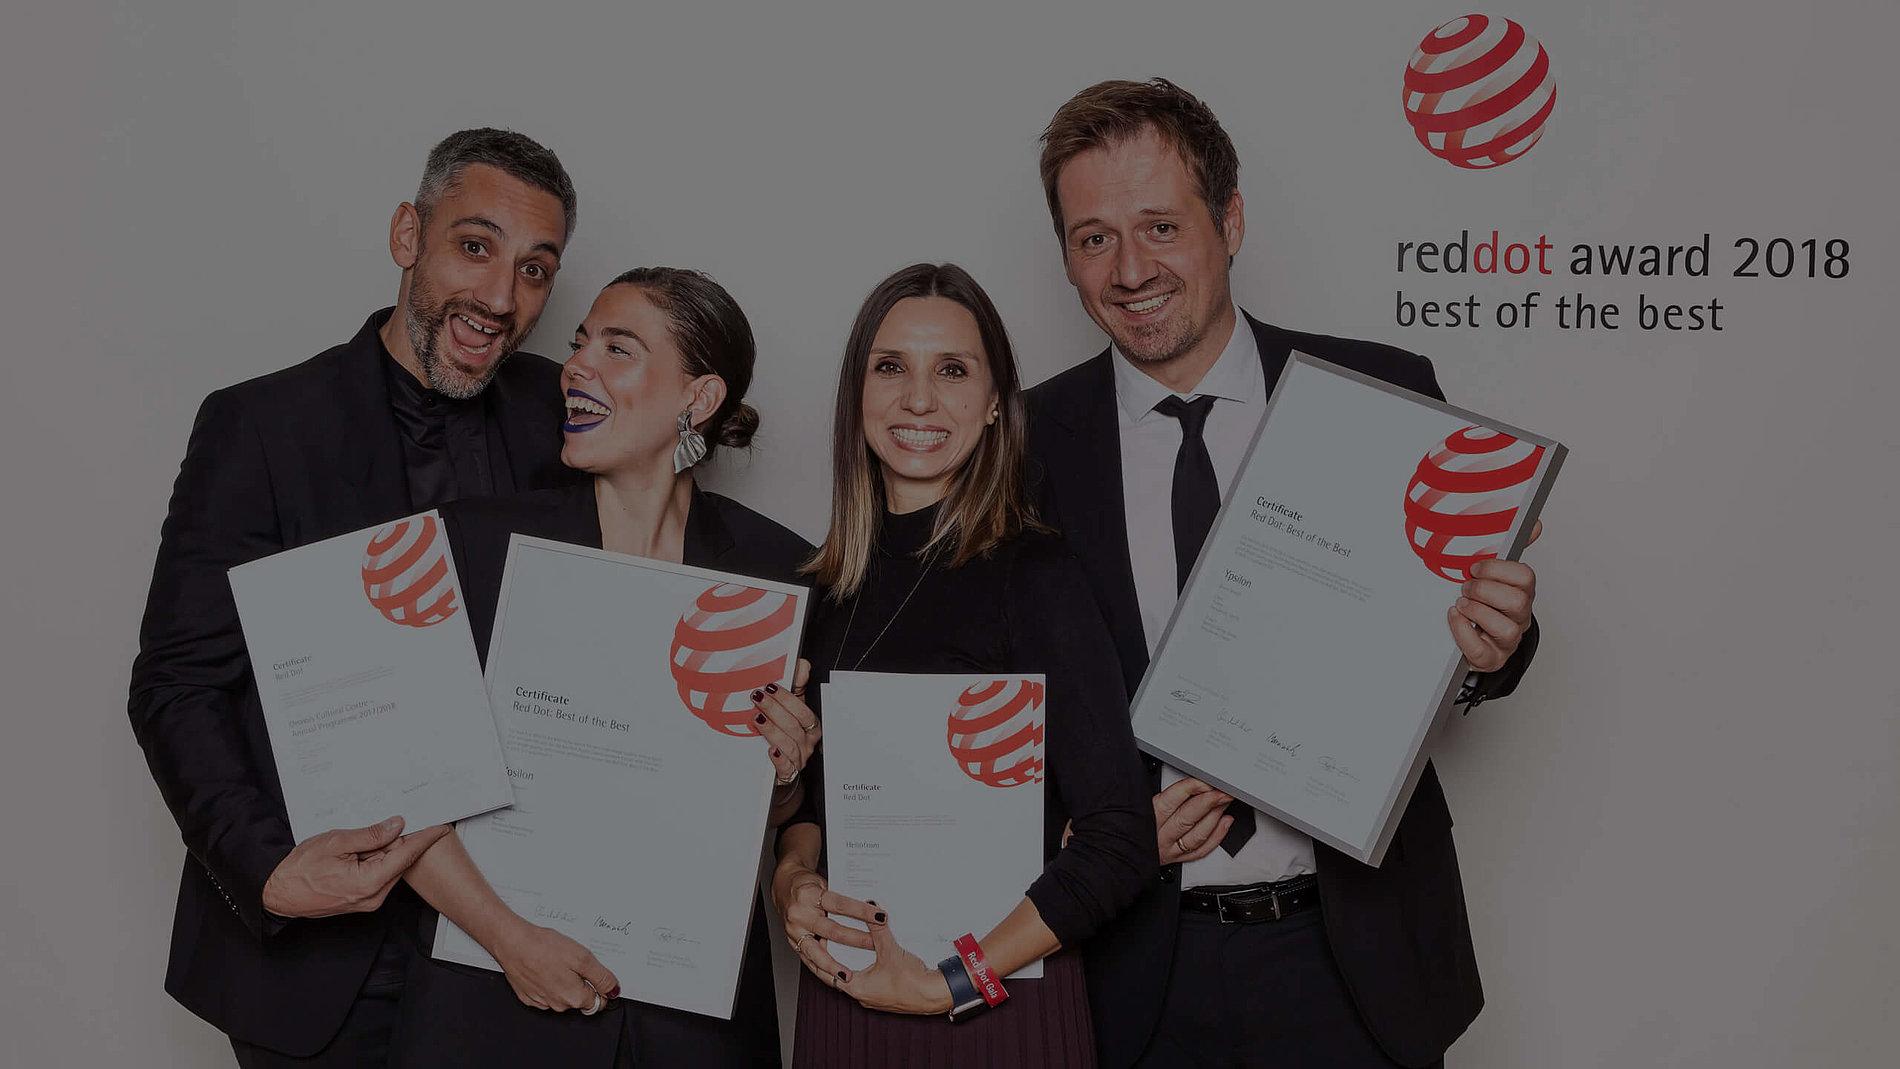 Red Dot Award Brands Communication Design 2019 Commences Red Dot